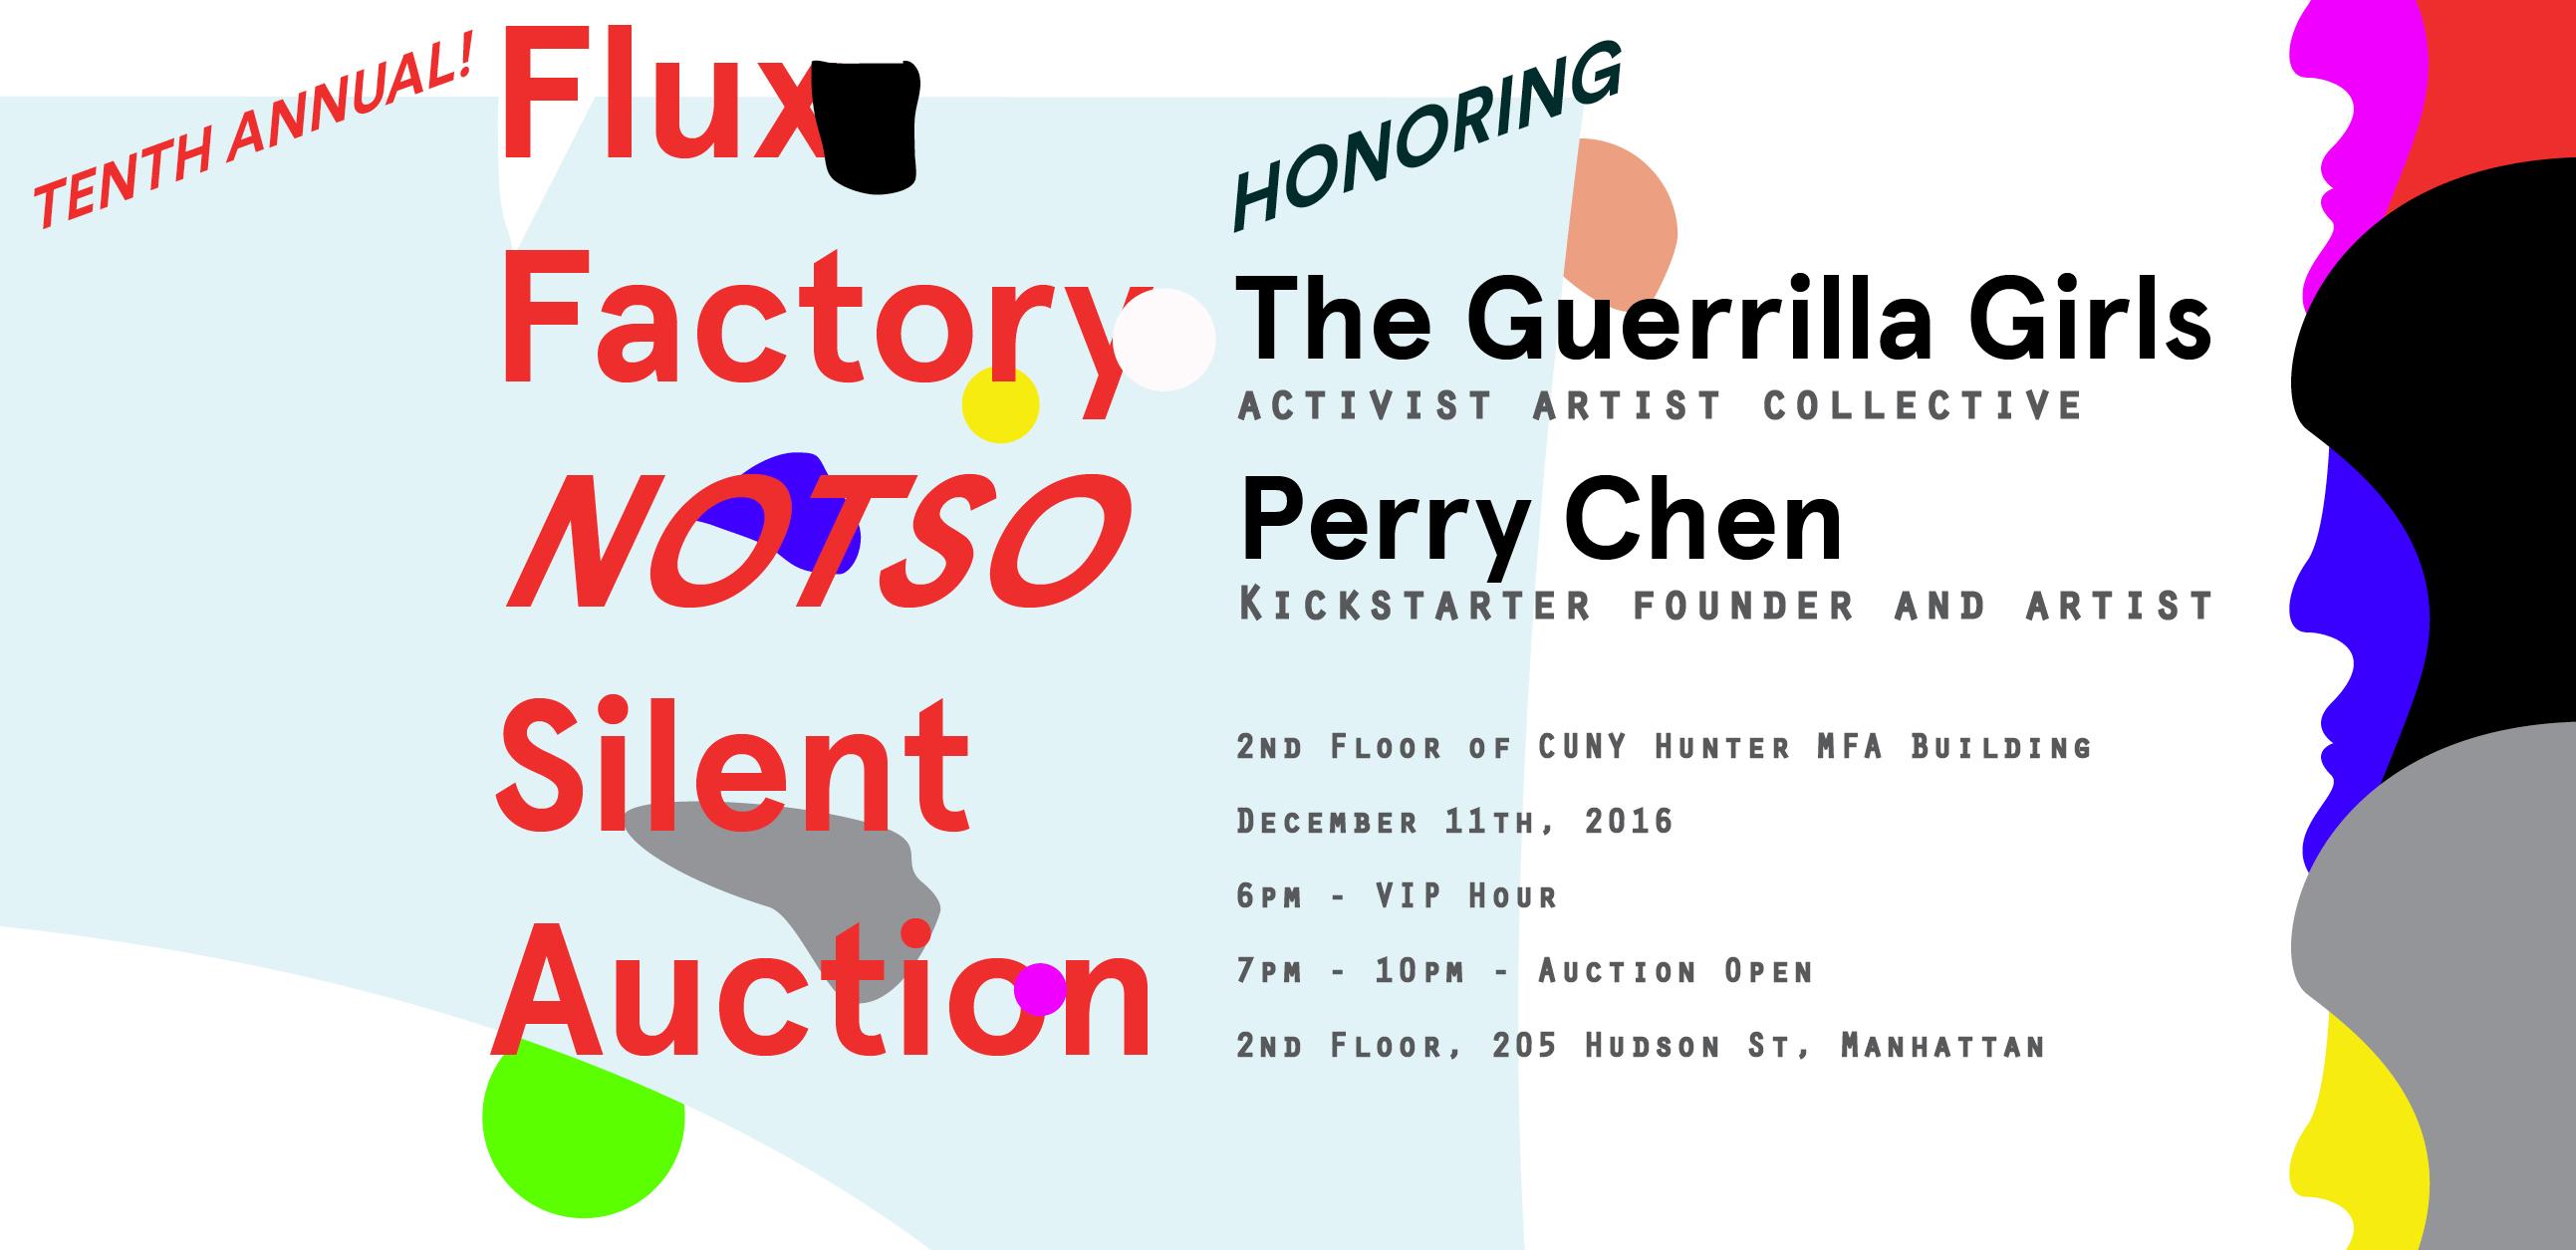 Flux Factory's Tenth Annual Auction